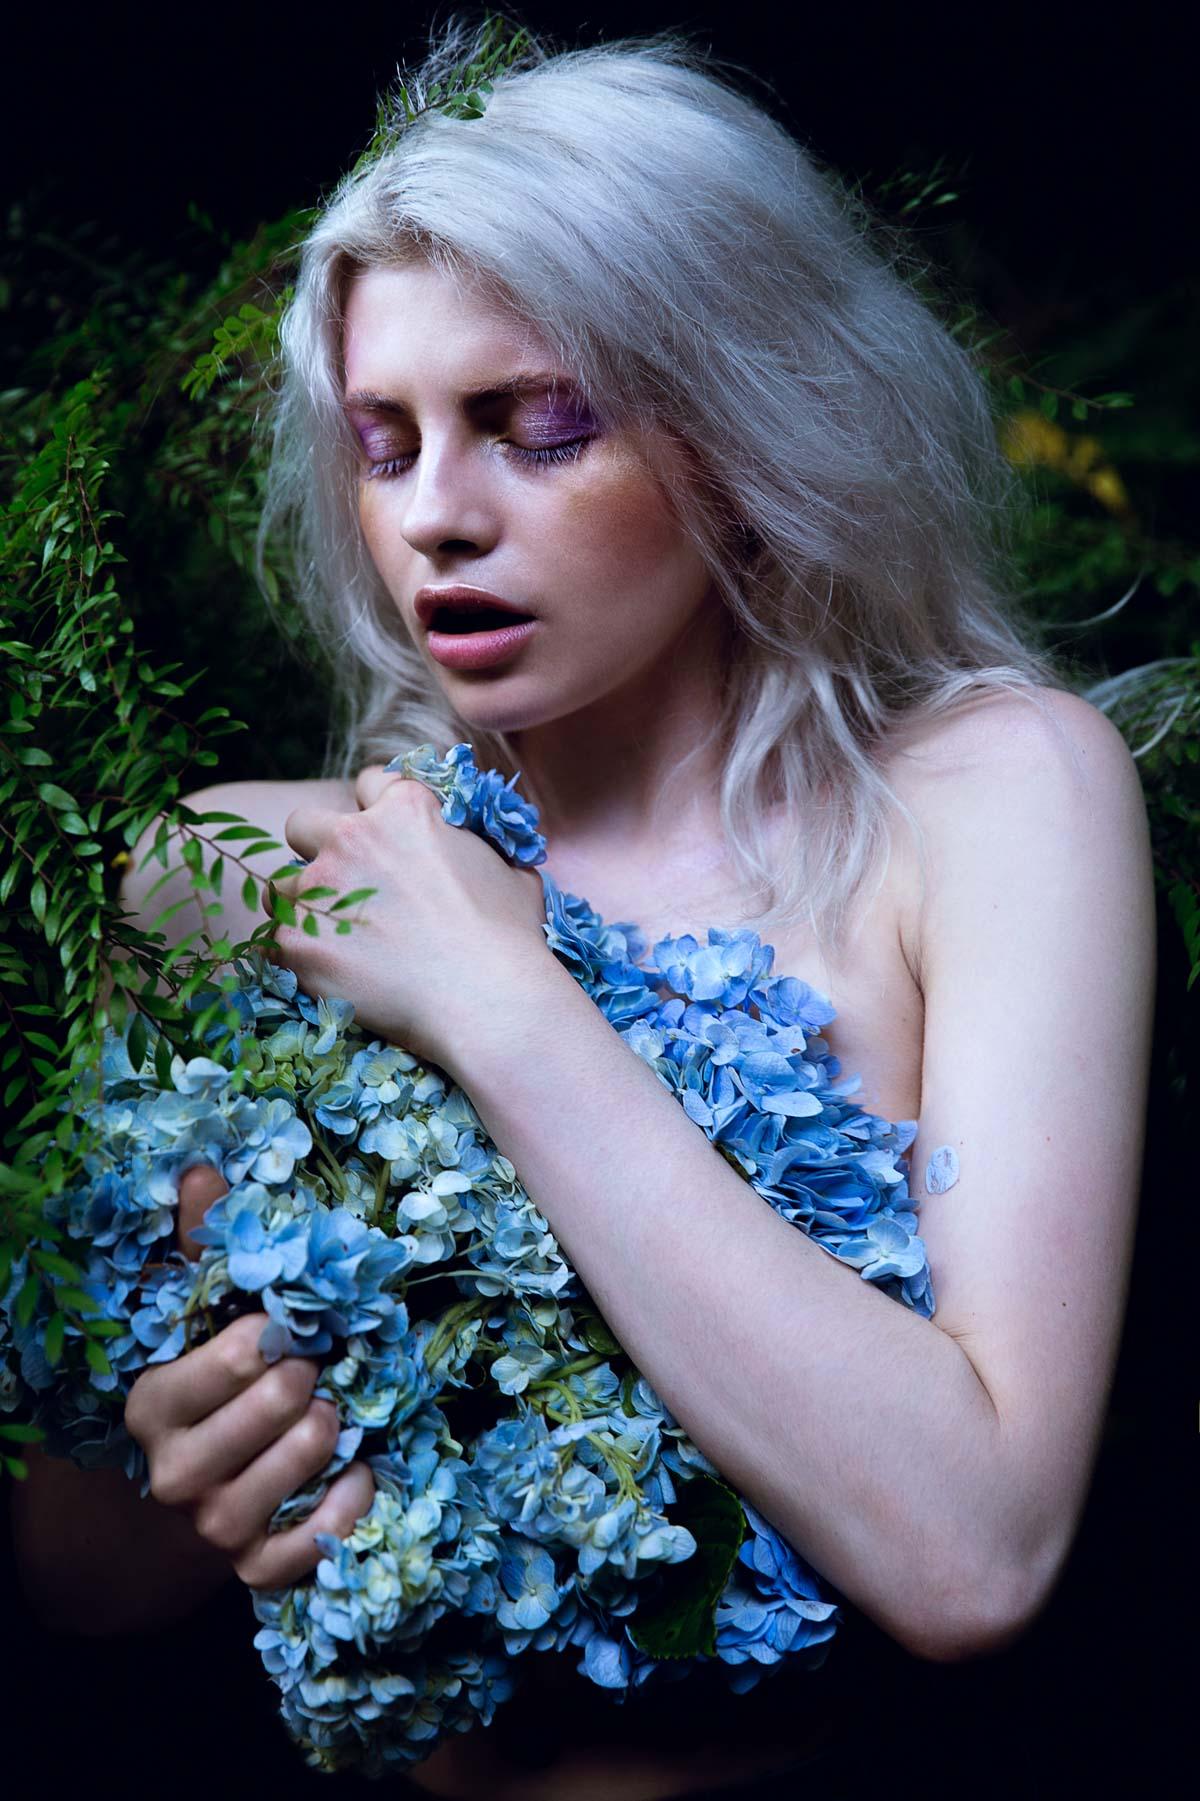 the_forest_magazine_amberly_valentine-neve-angie_angorro_0012